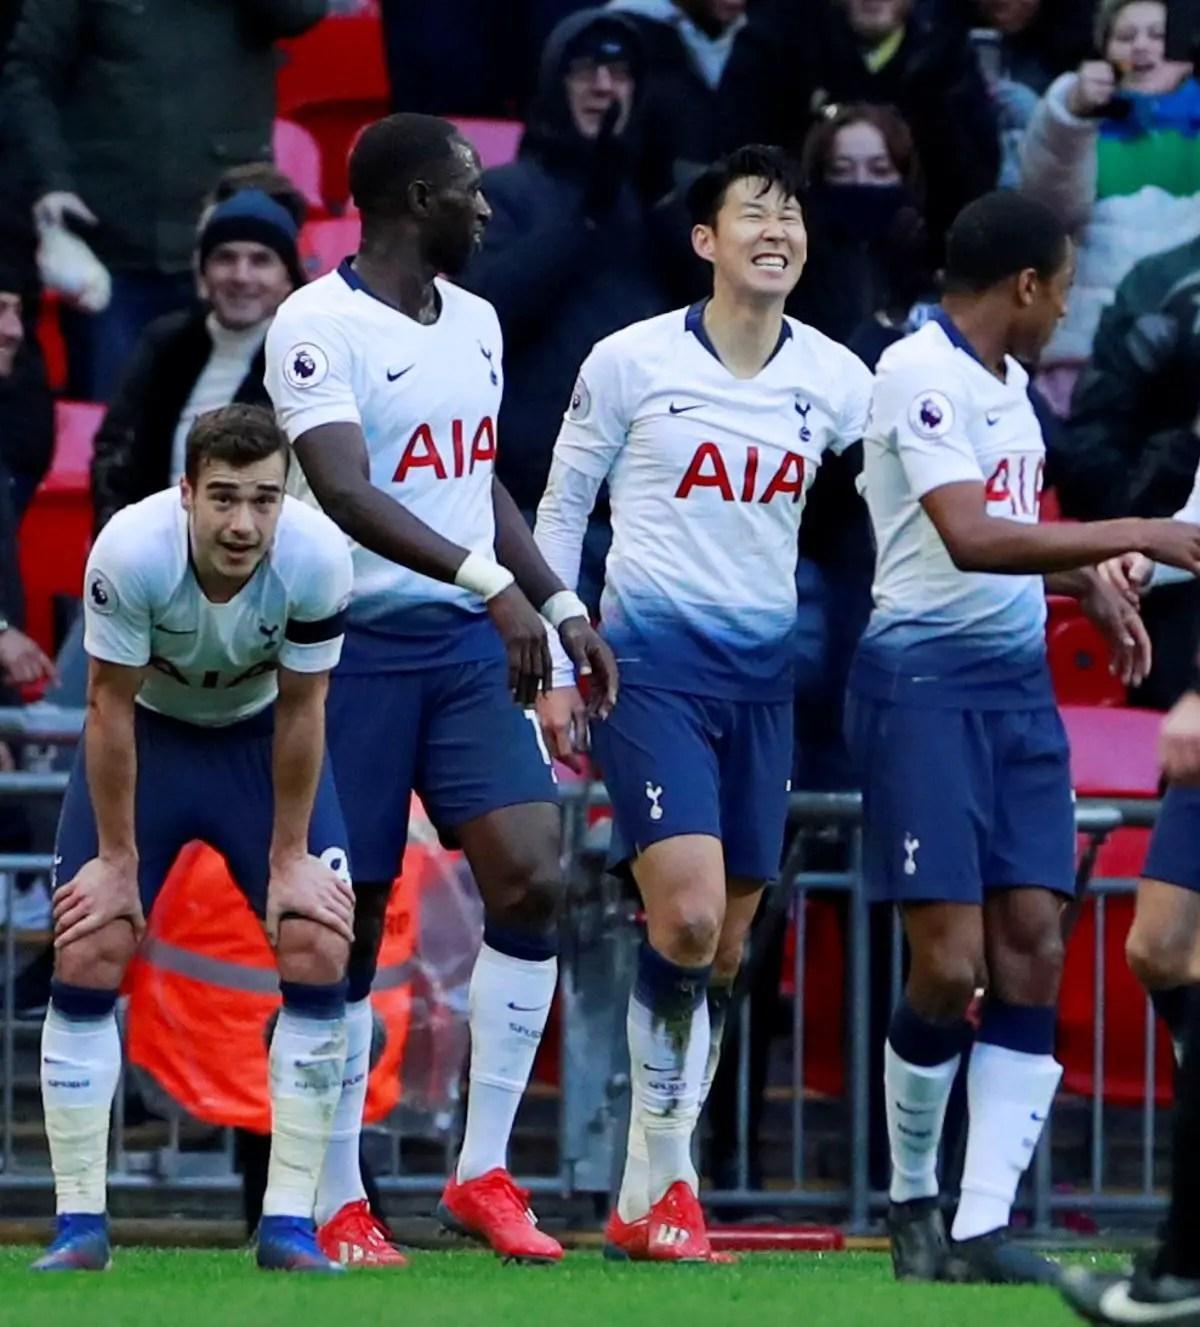 Son In Line For New Tottenham Deal